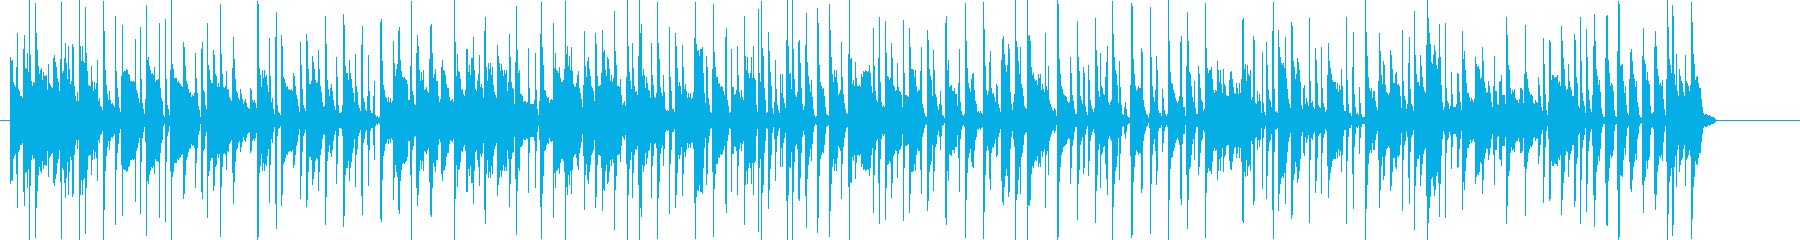 CMなどに最適なスラップベースの再生済みの波形